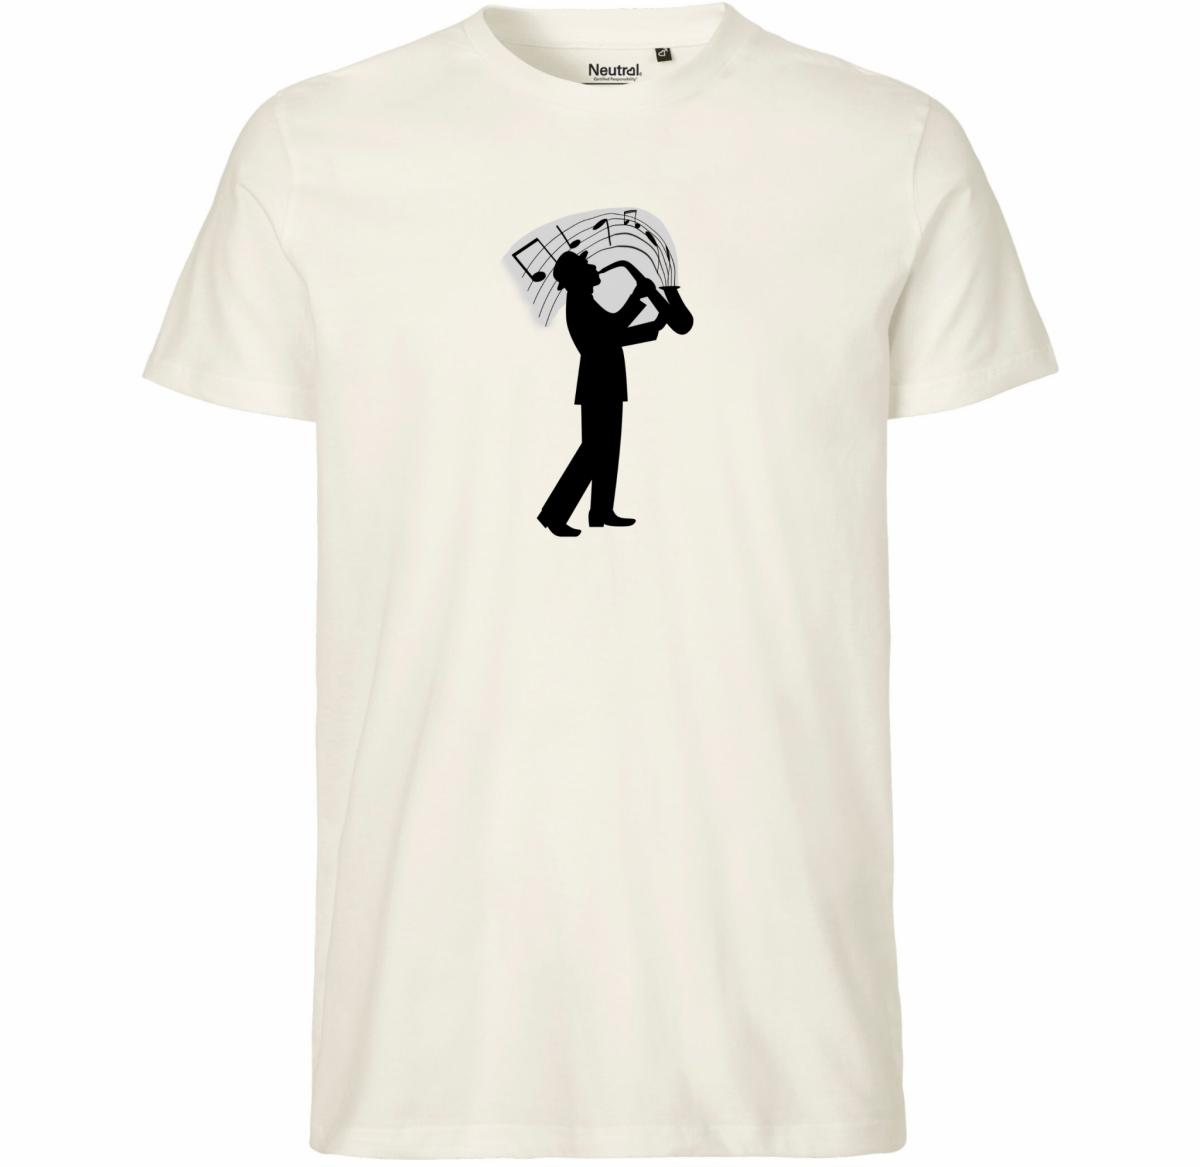 Tee-Shirt Homme - Joueur de Saxophone